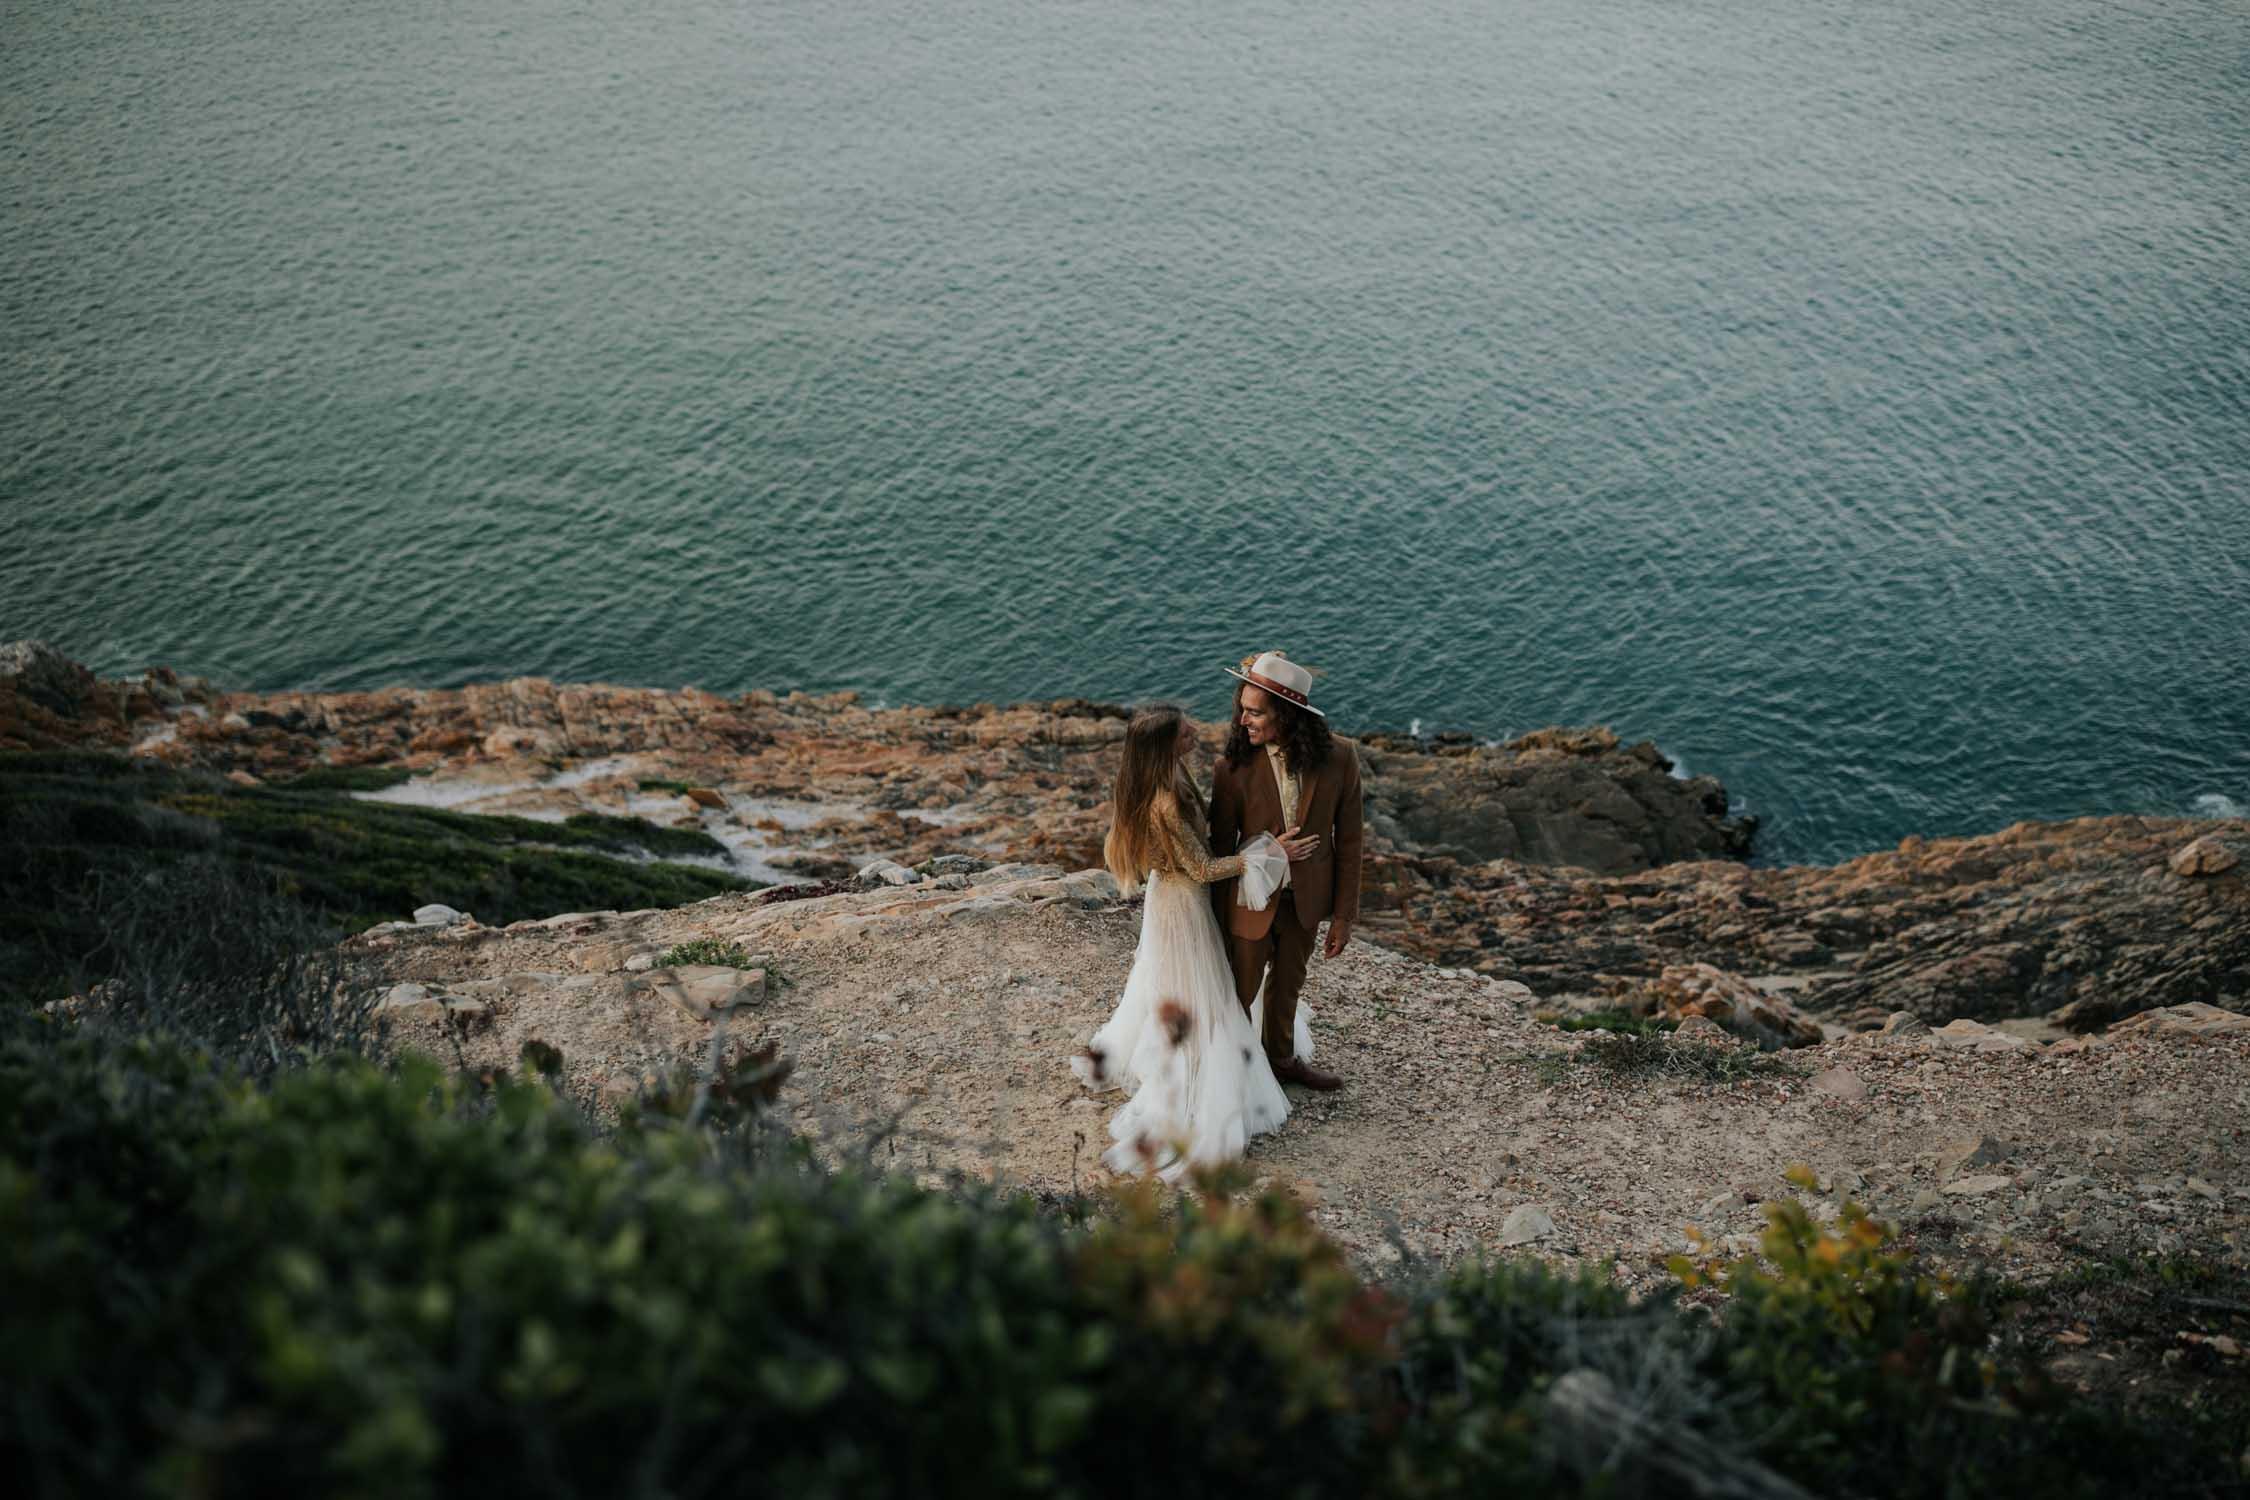 Epic scenery Vancouver Wedding Photographer